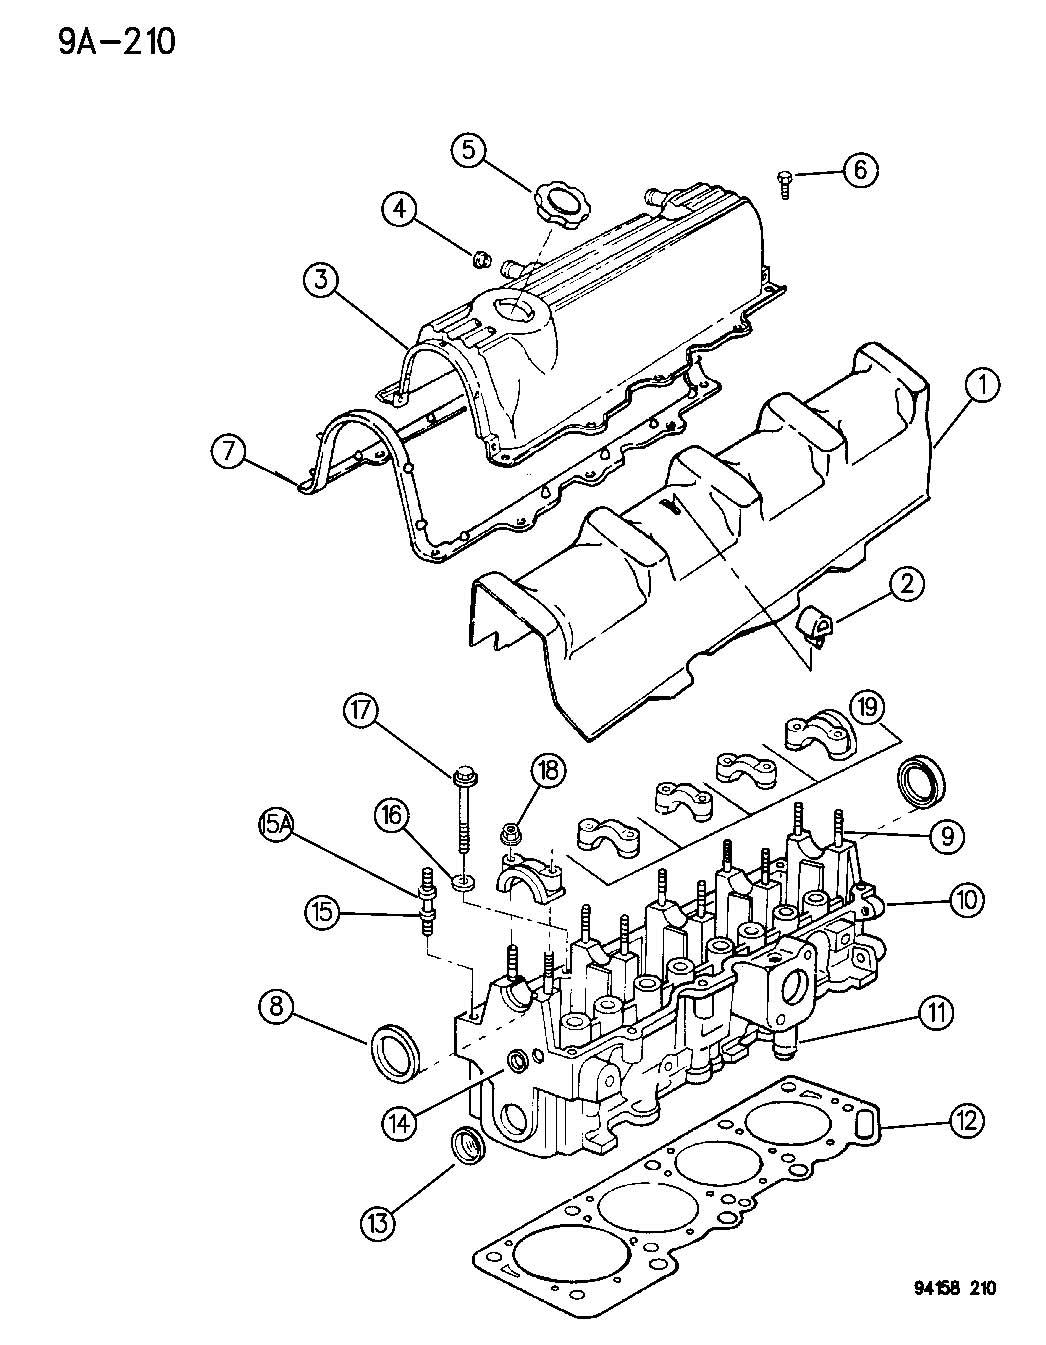 Chrysler Sebring Head Bolt Removal Diagram